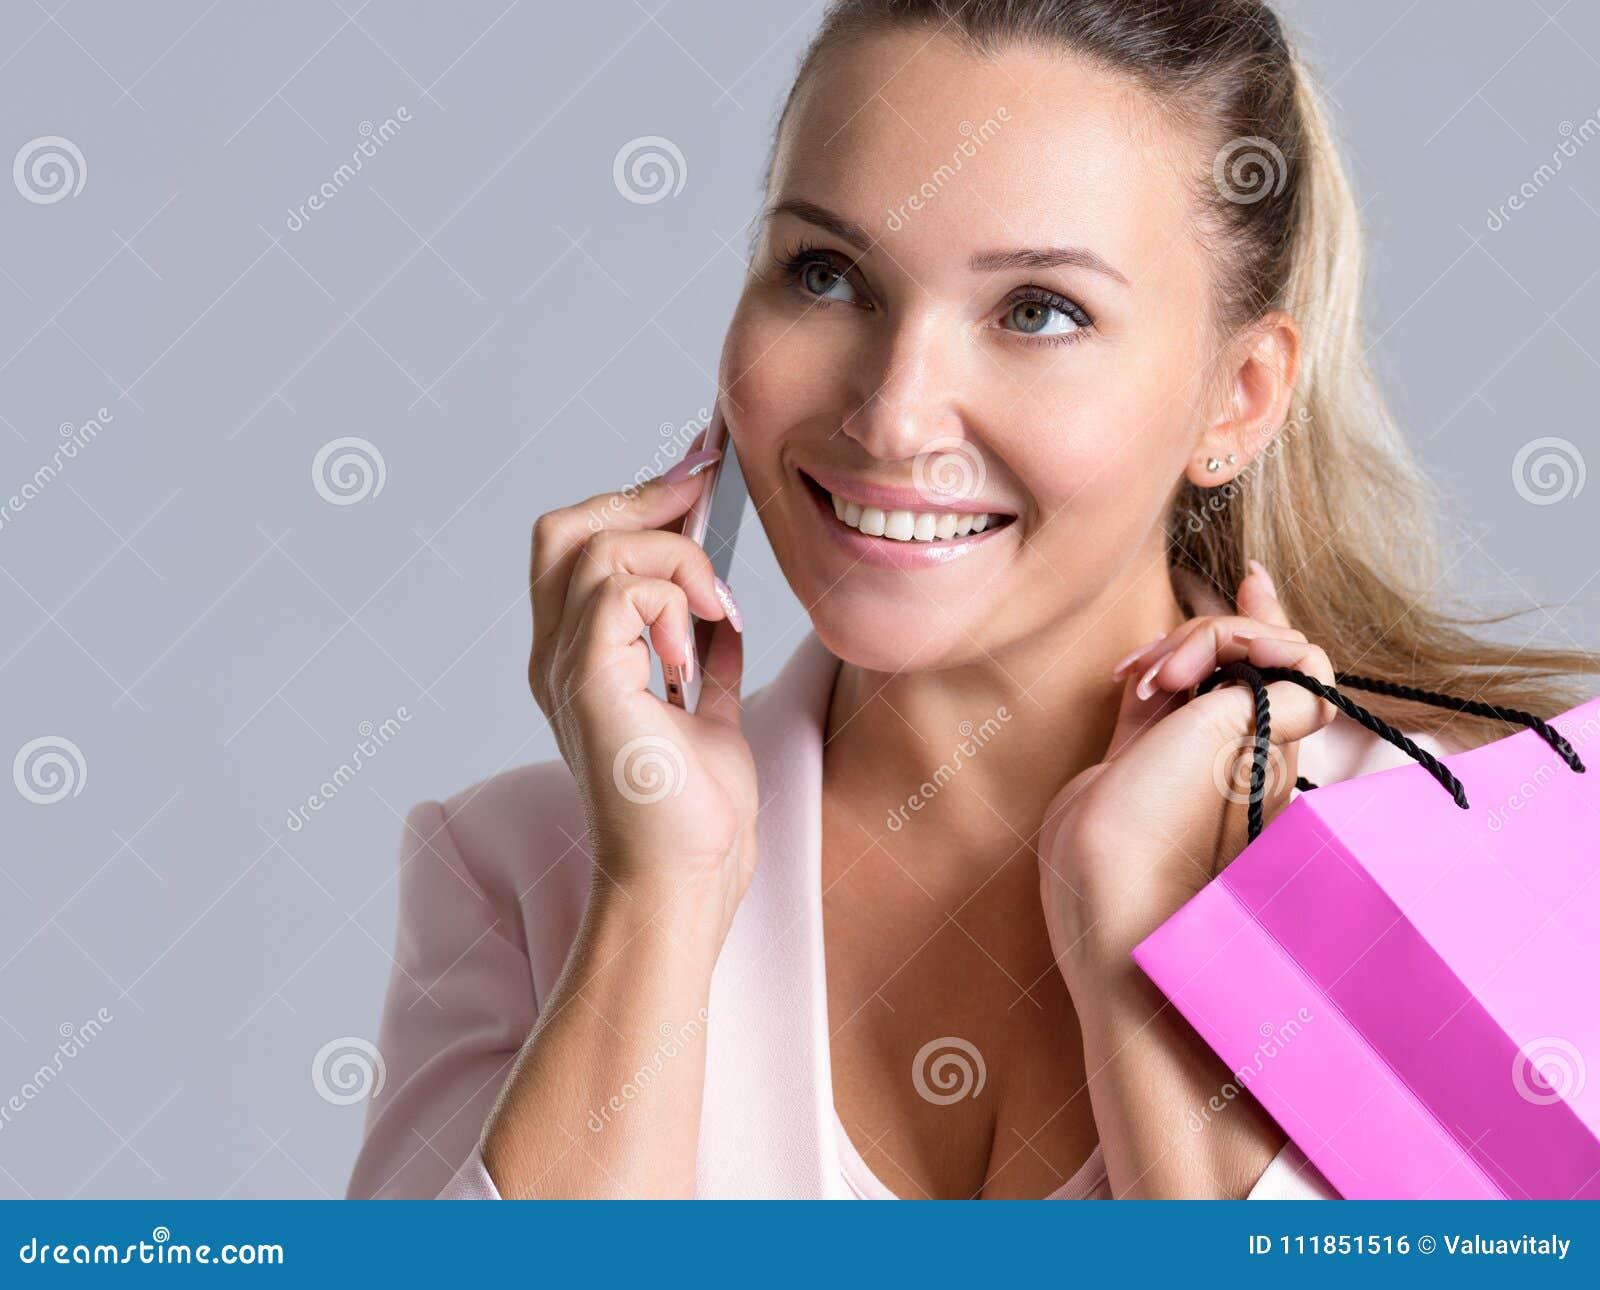 Portret van gelukkige glimlachende vrouw met roze zak die op A.M. spreekt